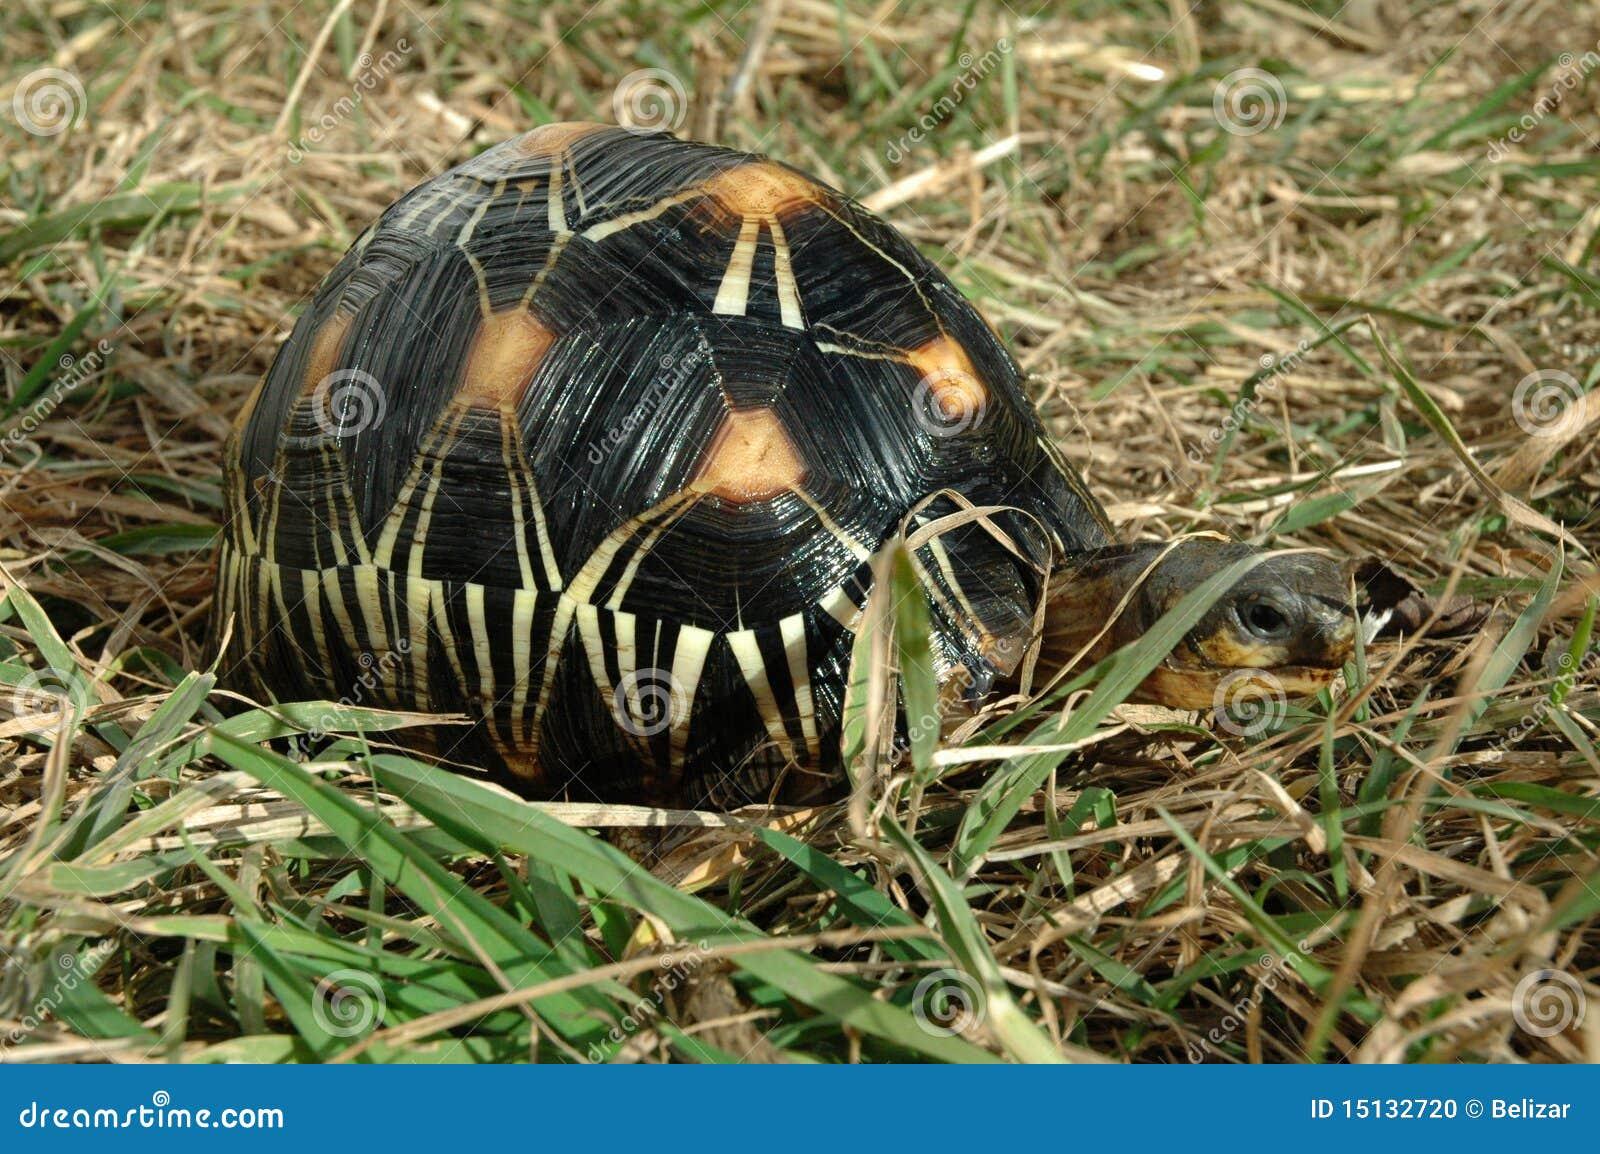 Radiated tortoise (Geochelone radiata)